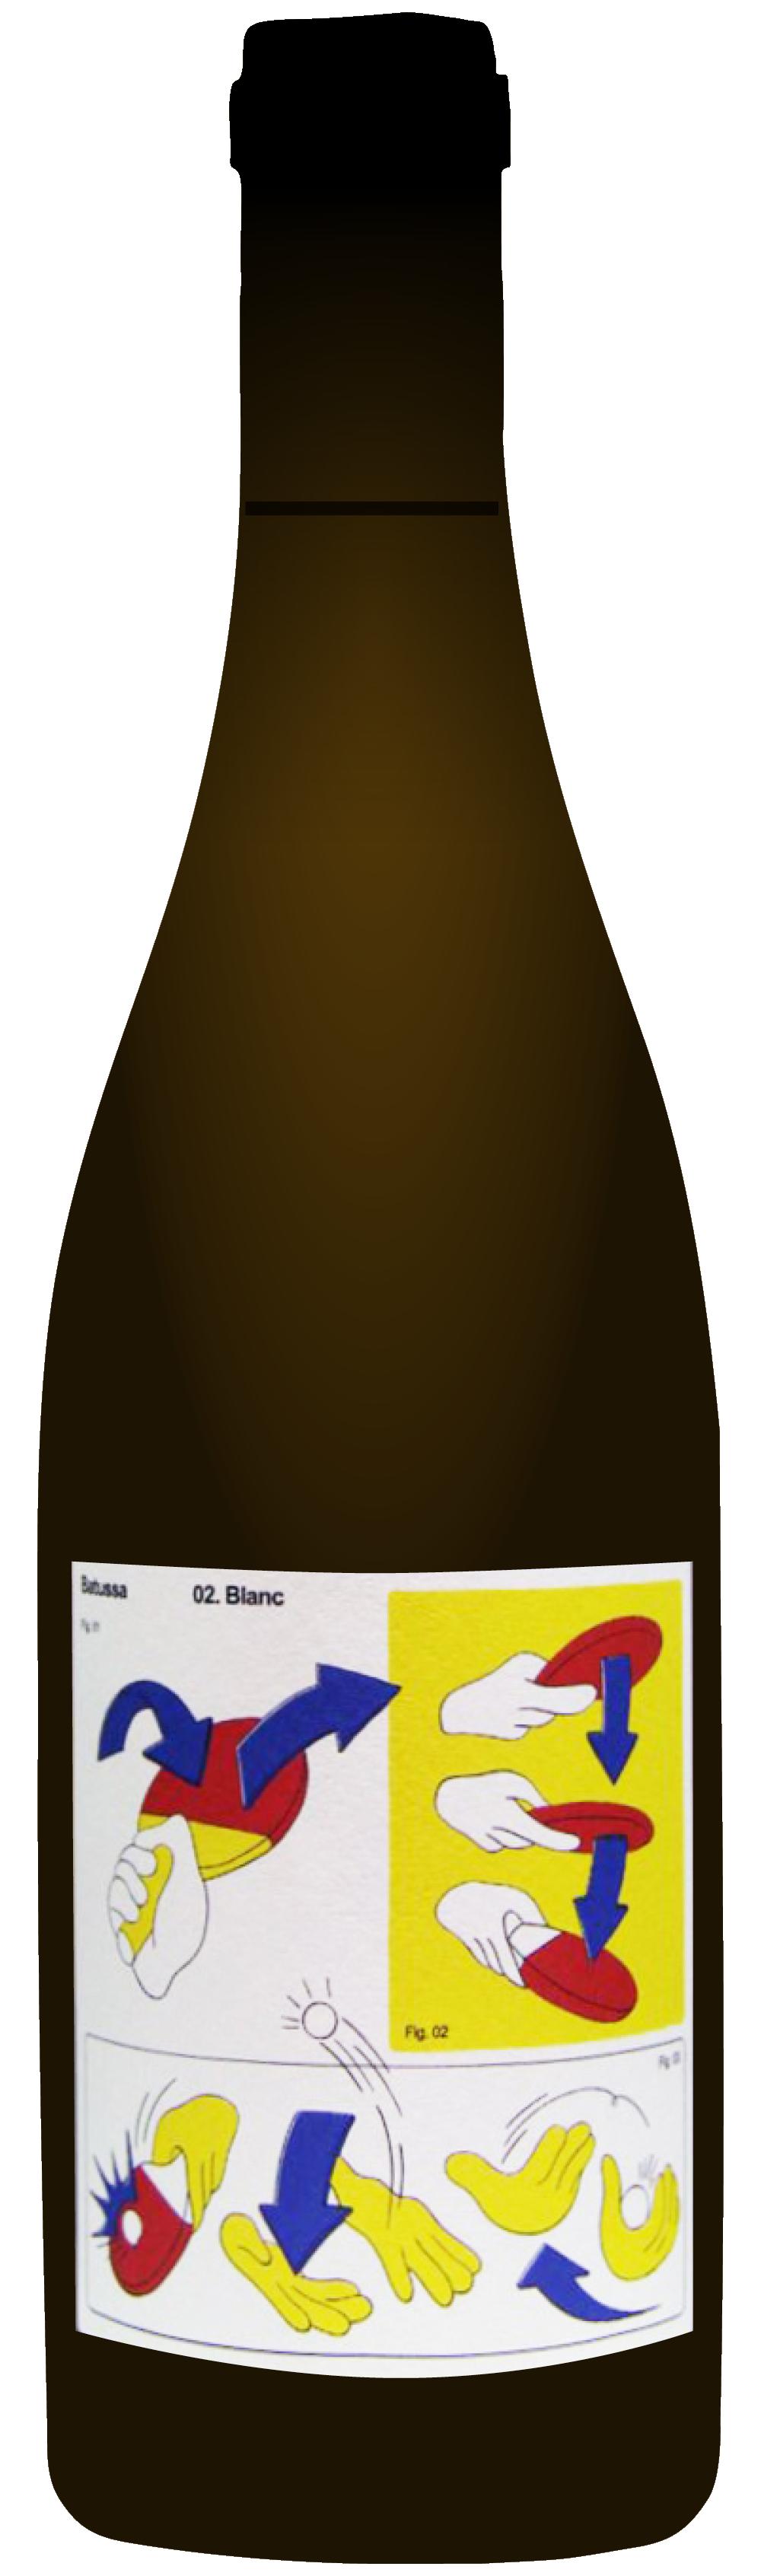 the natural wine company club august 2021 spain batussa blanc